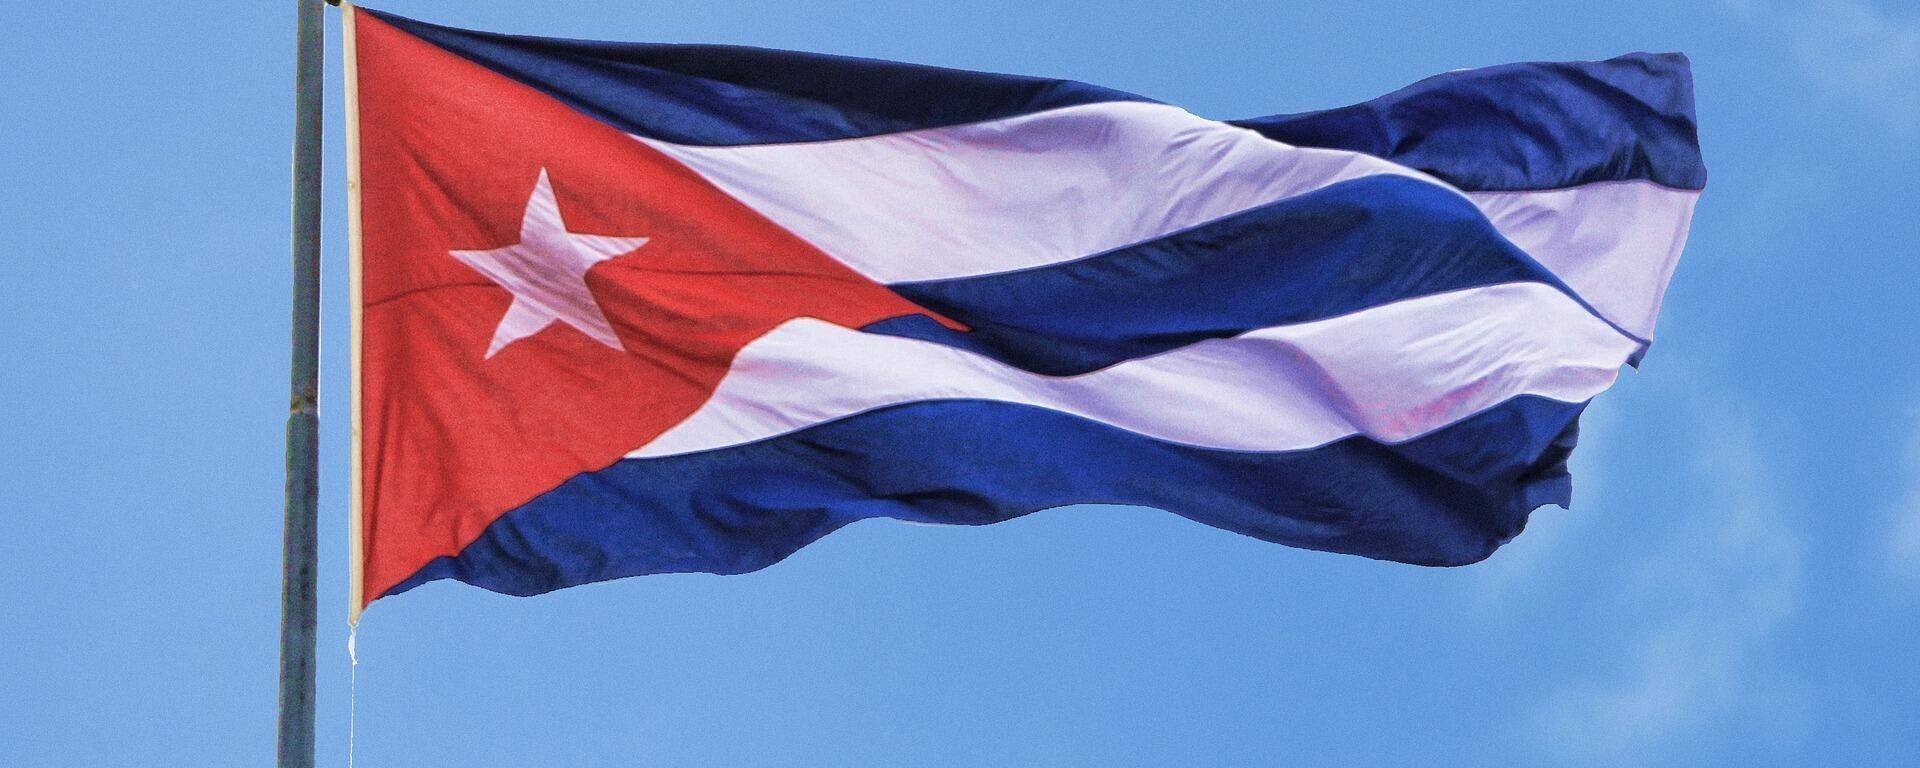 Flagge von Kuba (Symbolbild) - SNA, 1920, 27.07.2021